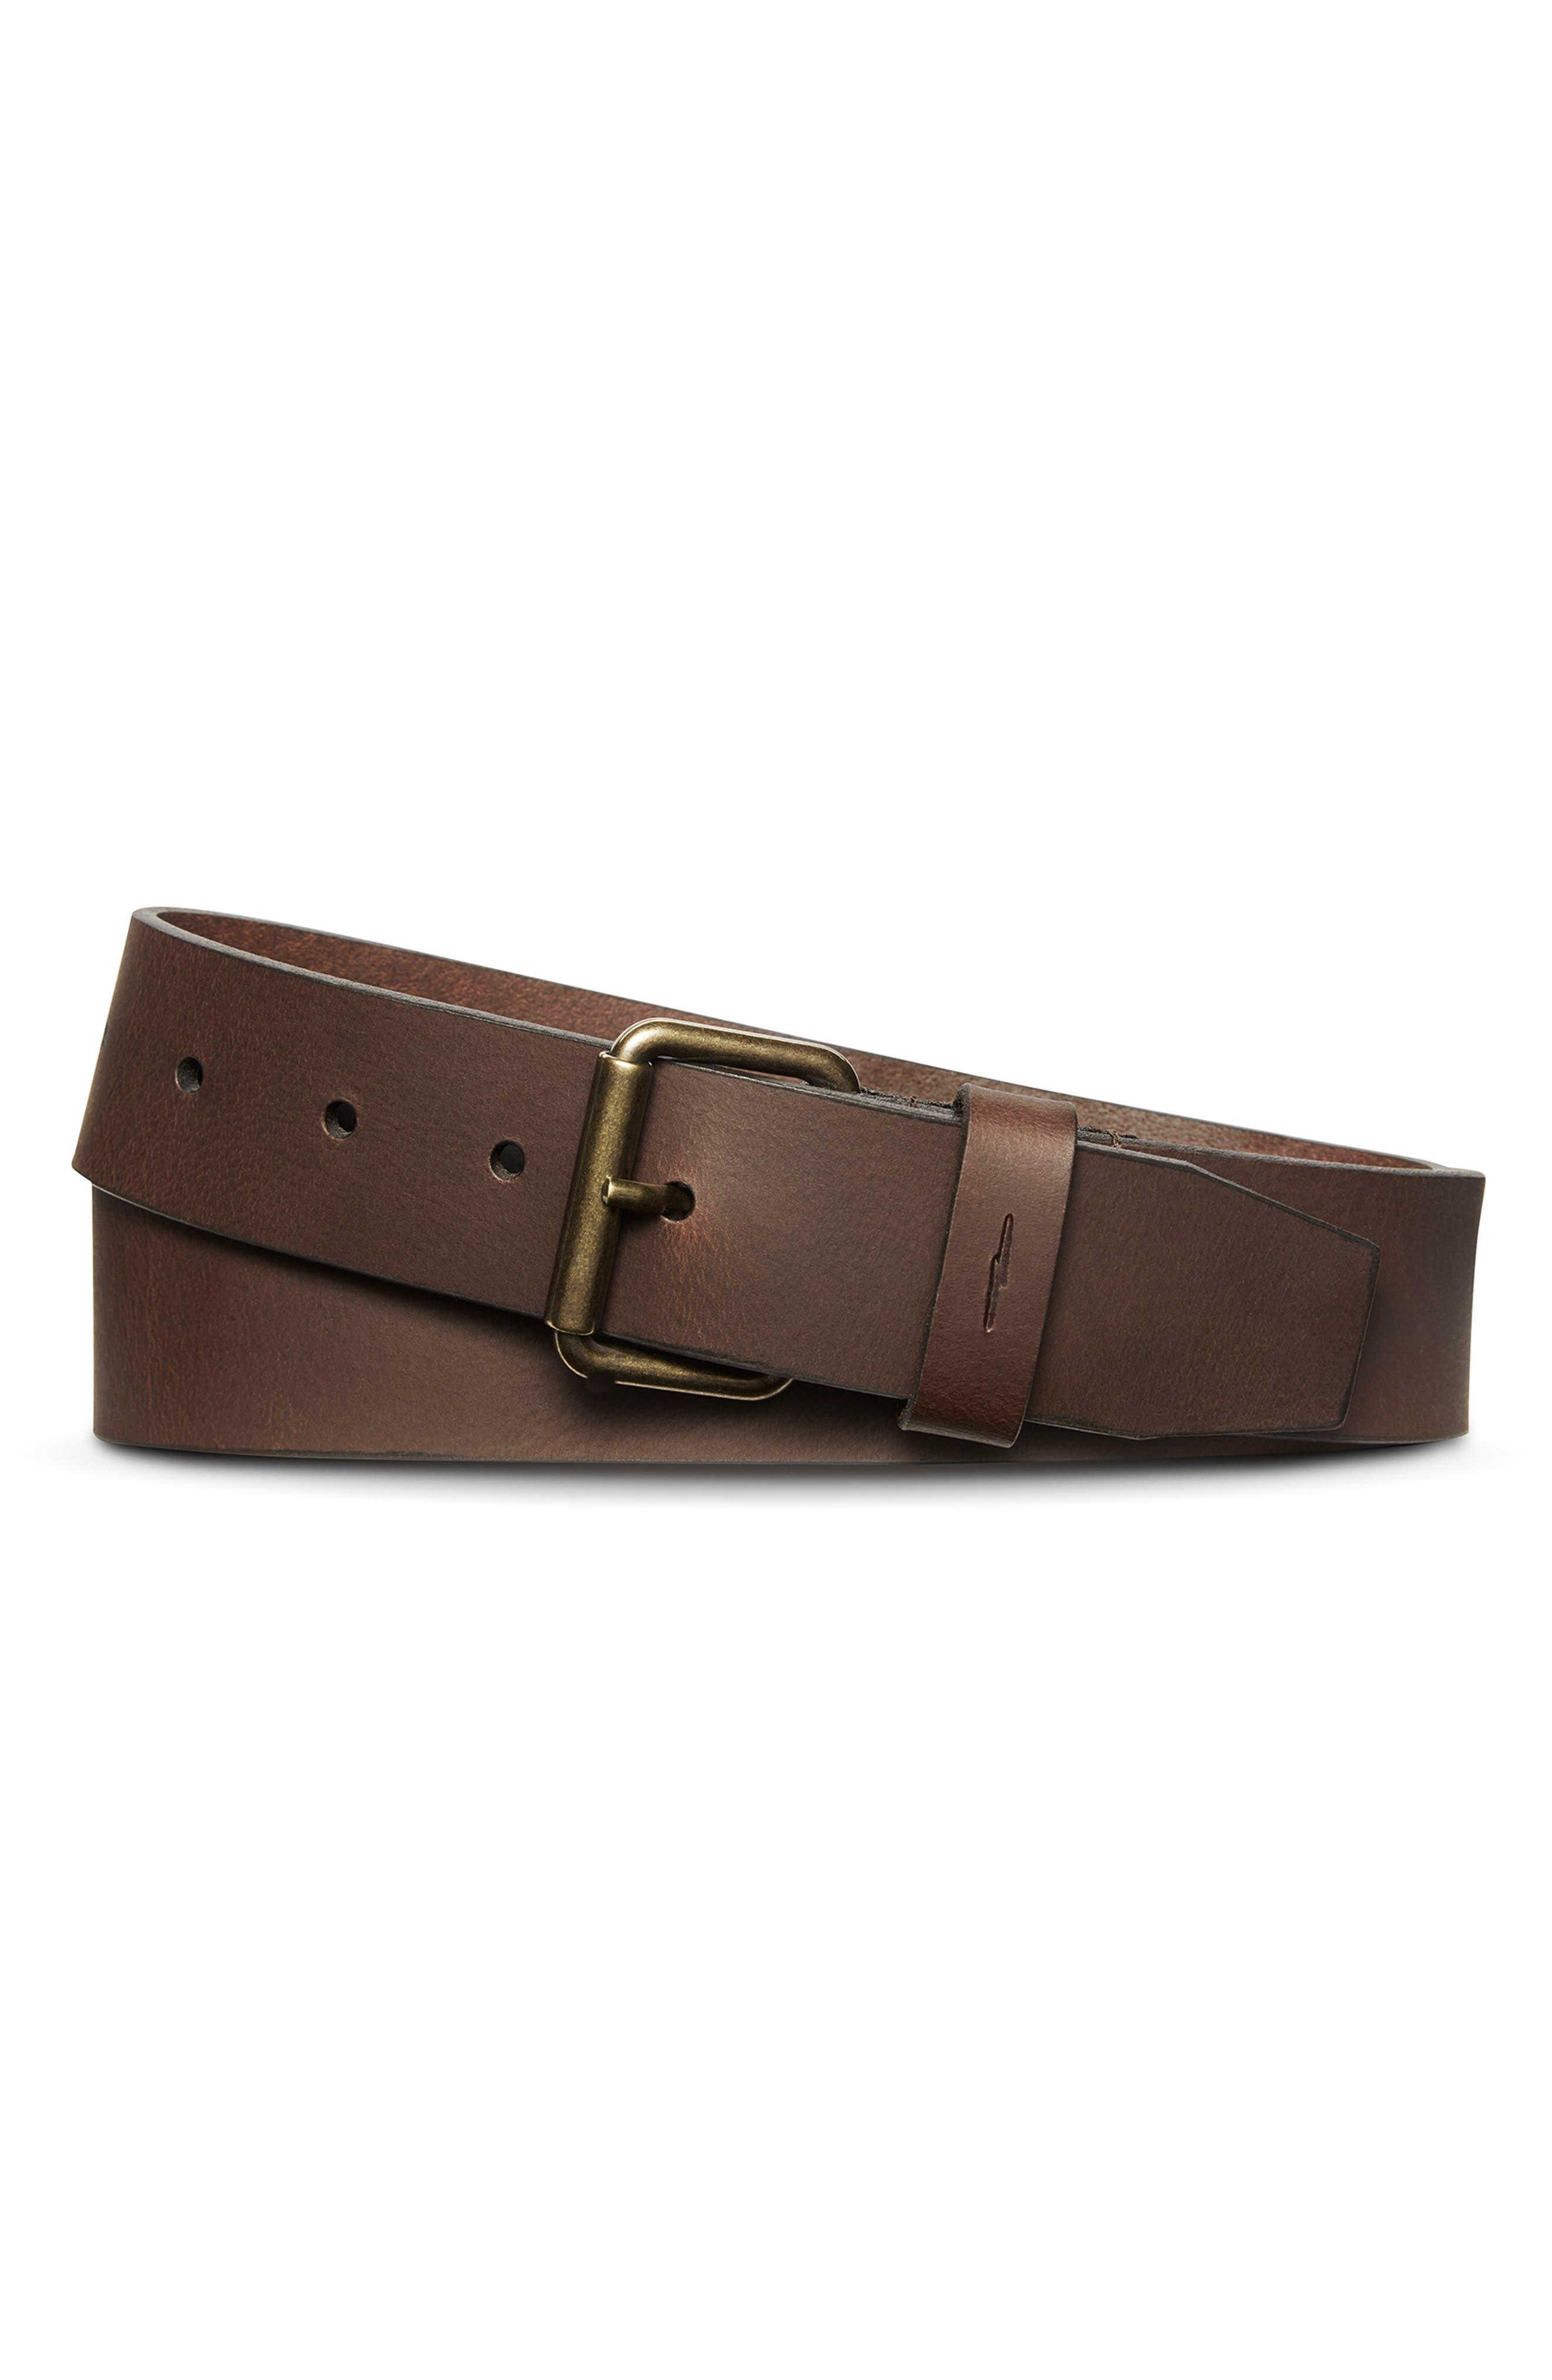 Shinola Rambler Leather Belt, Dark Brown